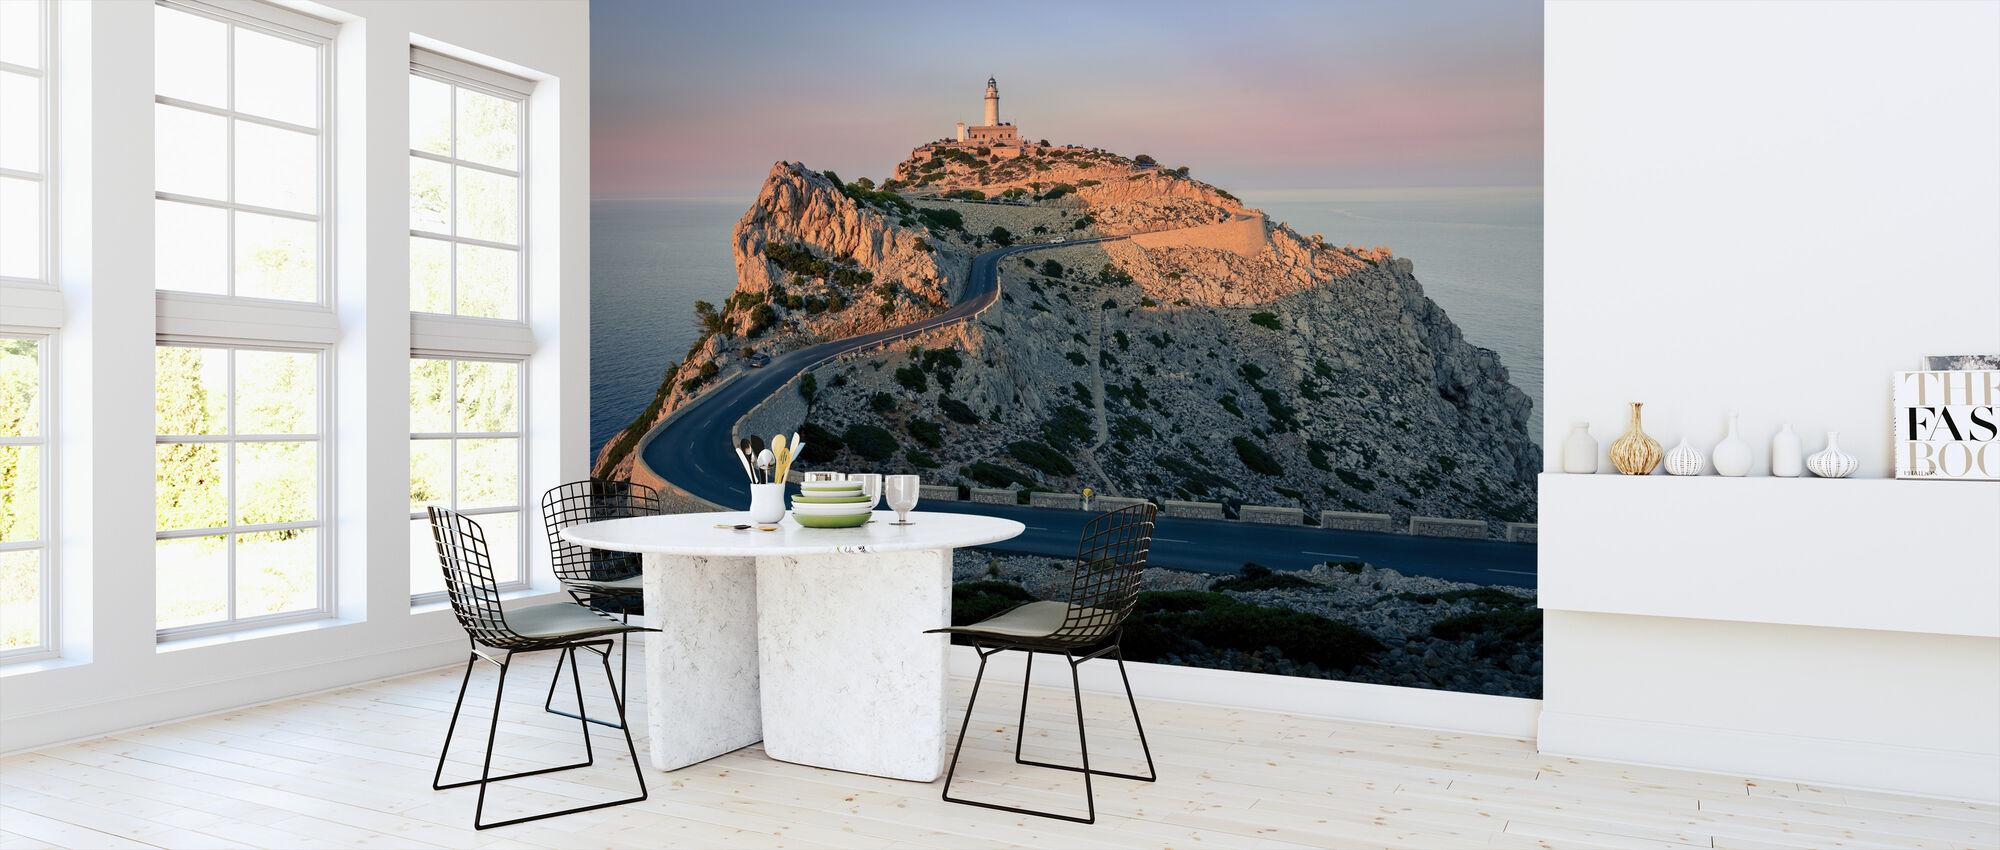 Lighthouse at Cap Formentor - Mallorca - Wallpaper - Kitchen